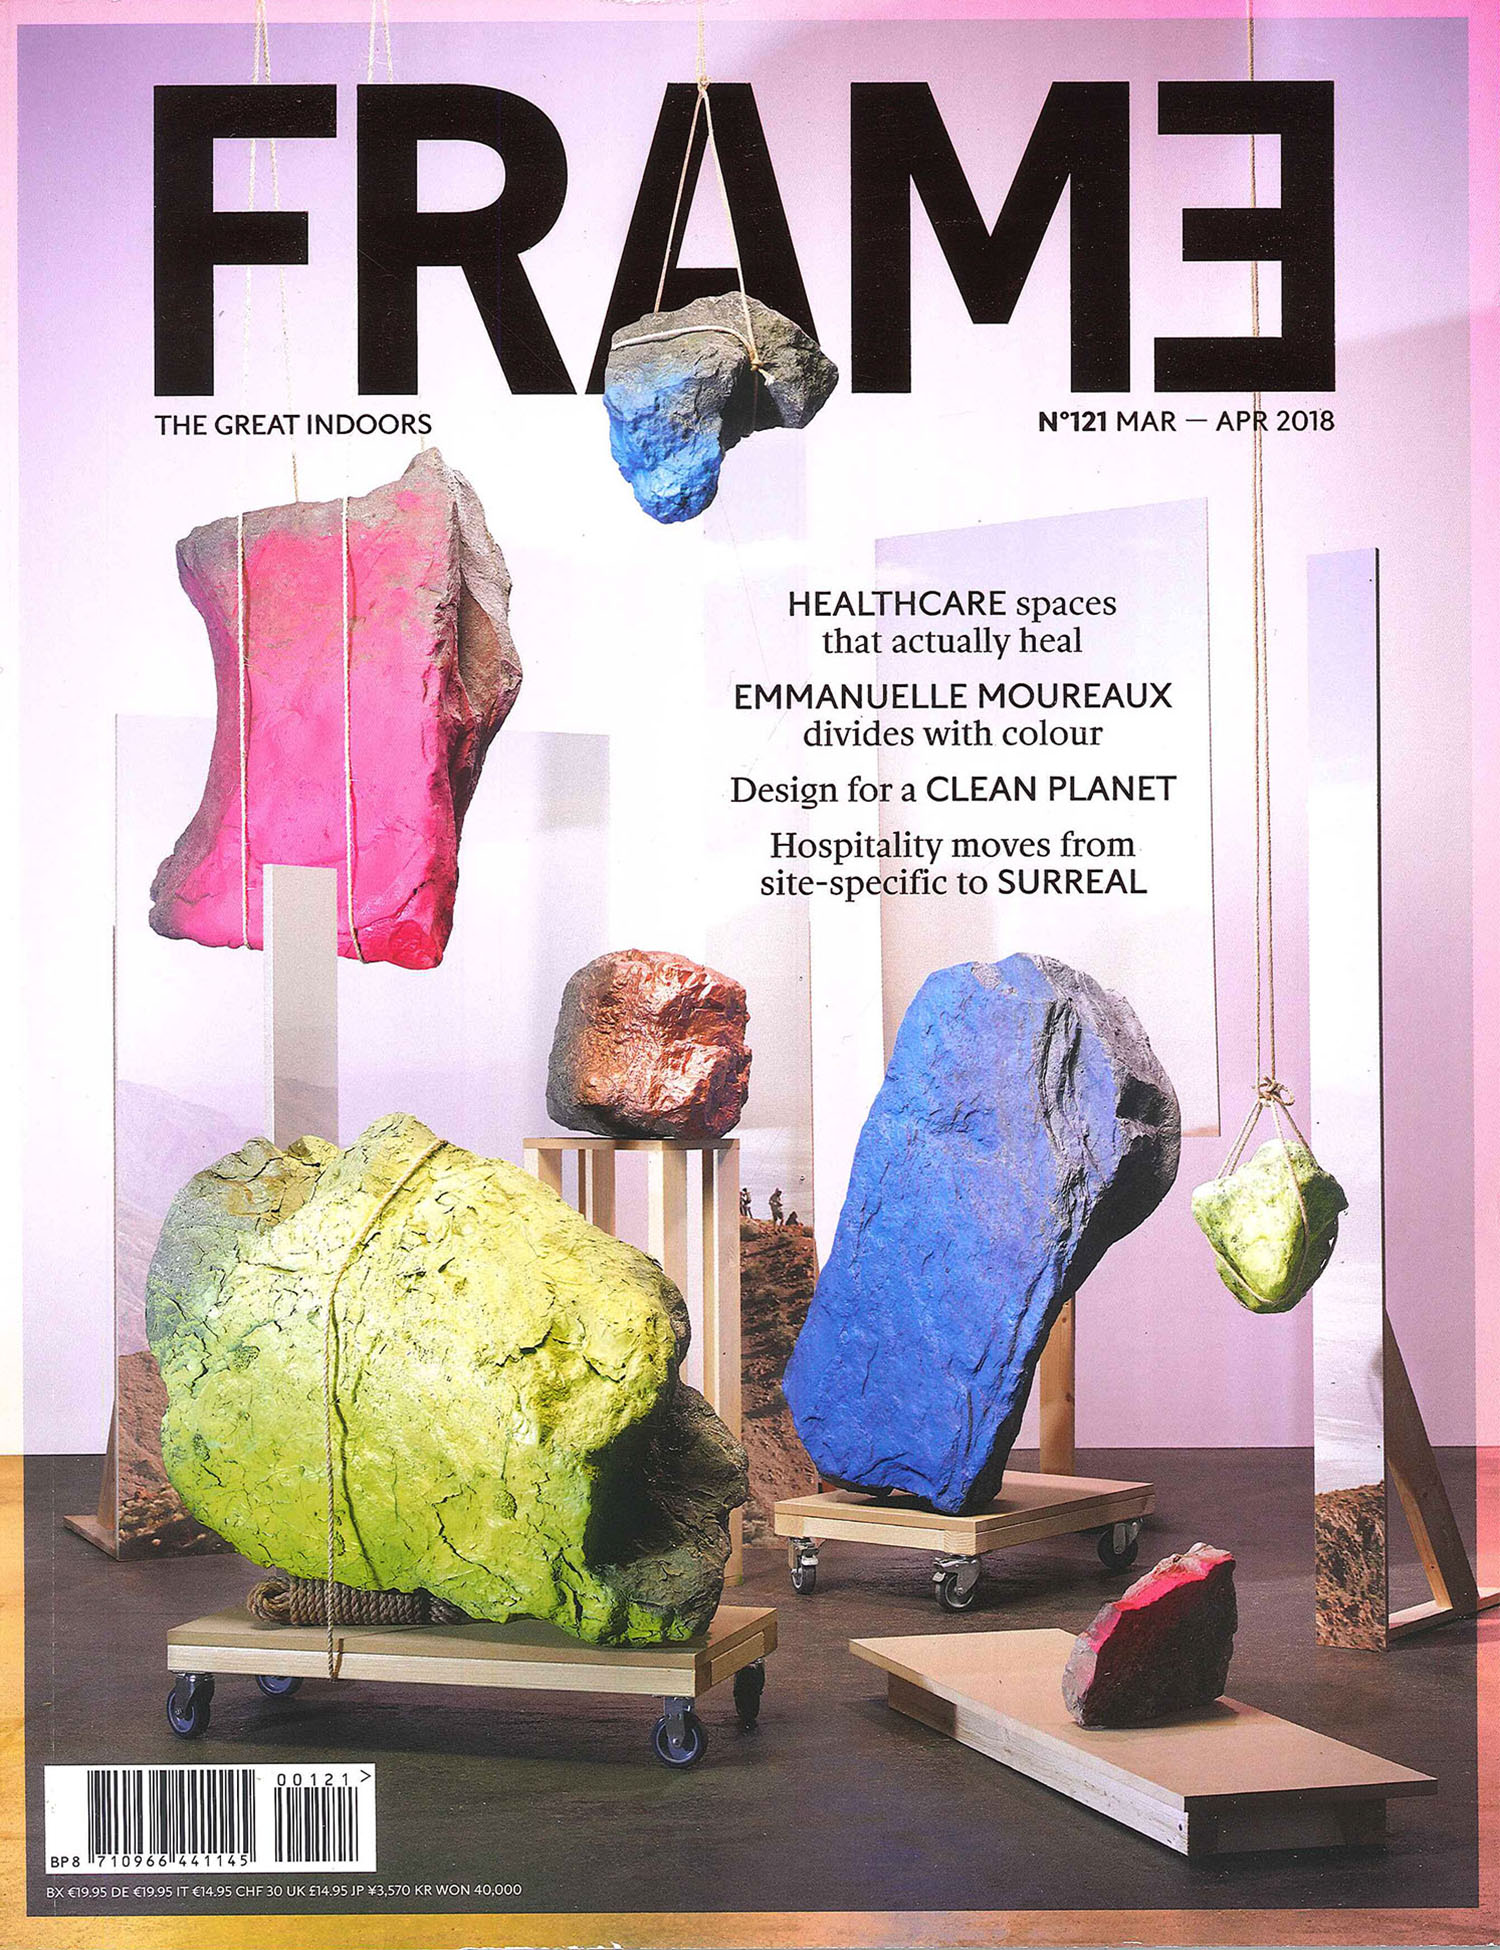 Emmanuelle Moureaux Chroma Queen<br>FRAME Mar-Apr 2018 (English)